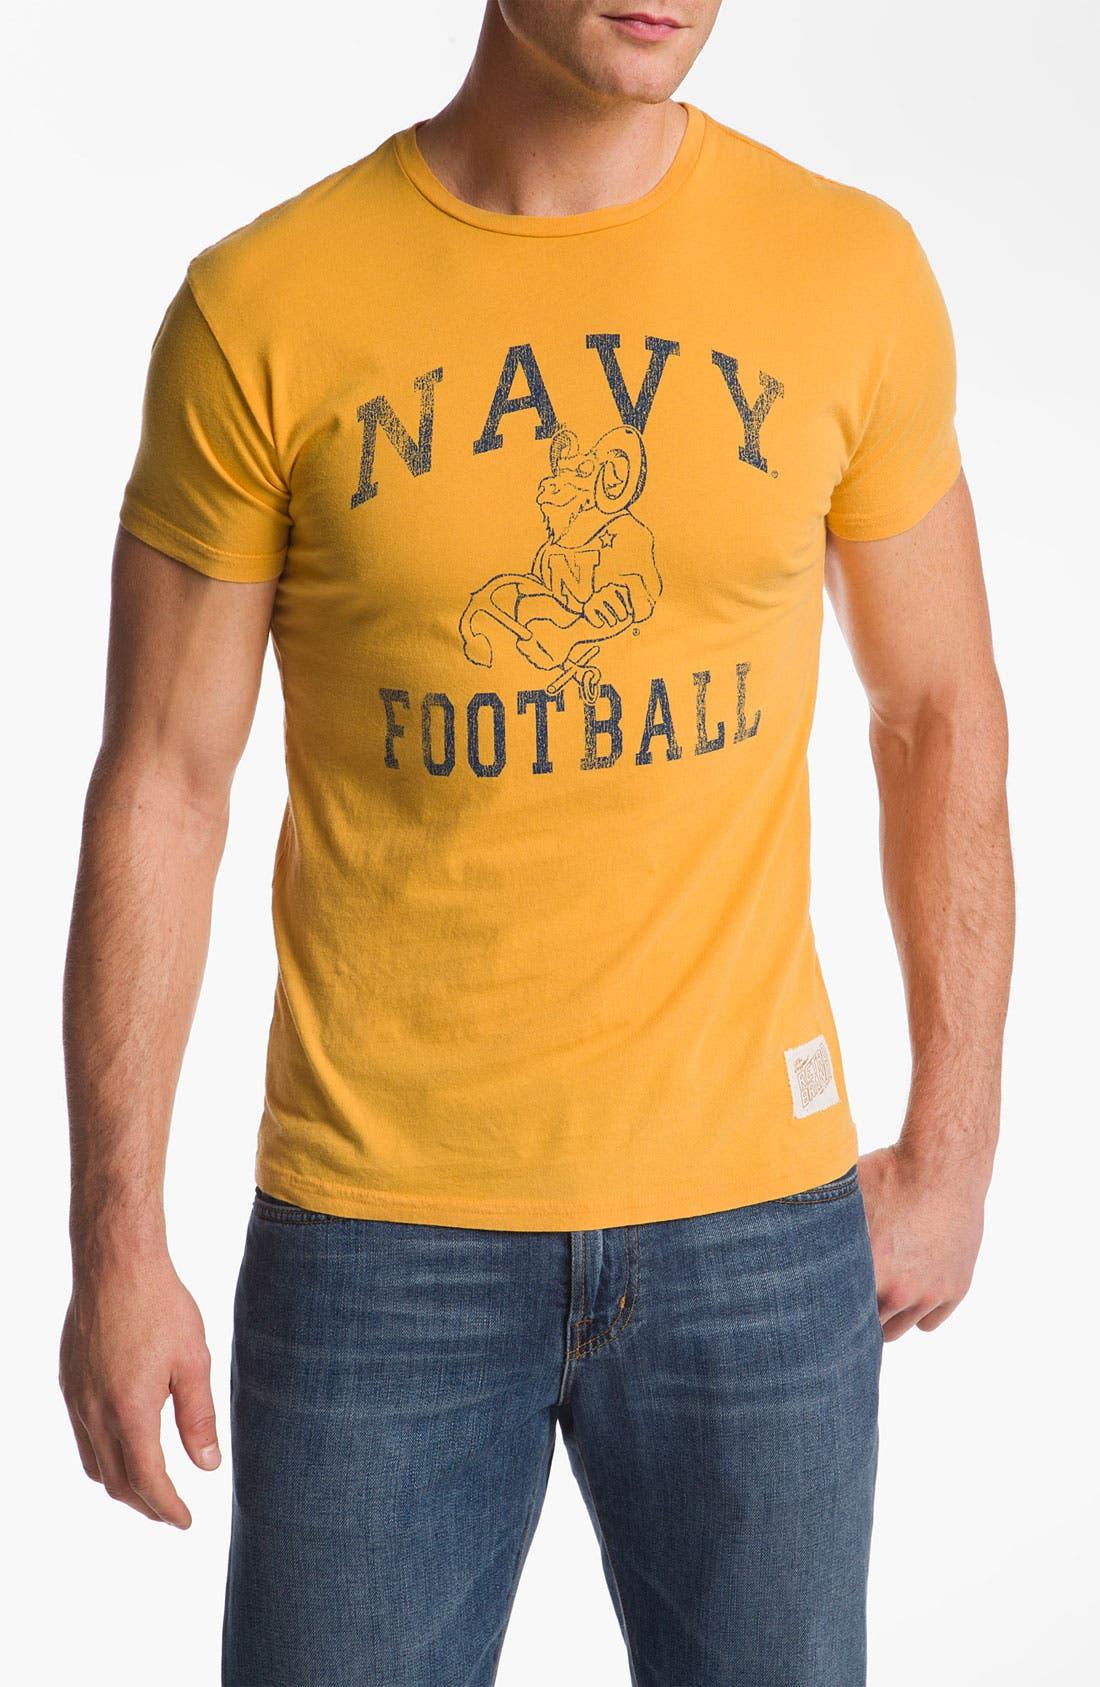 Alternate Image 1 Selected - The Original Retro Brand 'US Navy Midshipmen' T-Shirt